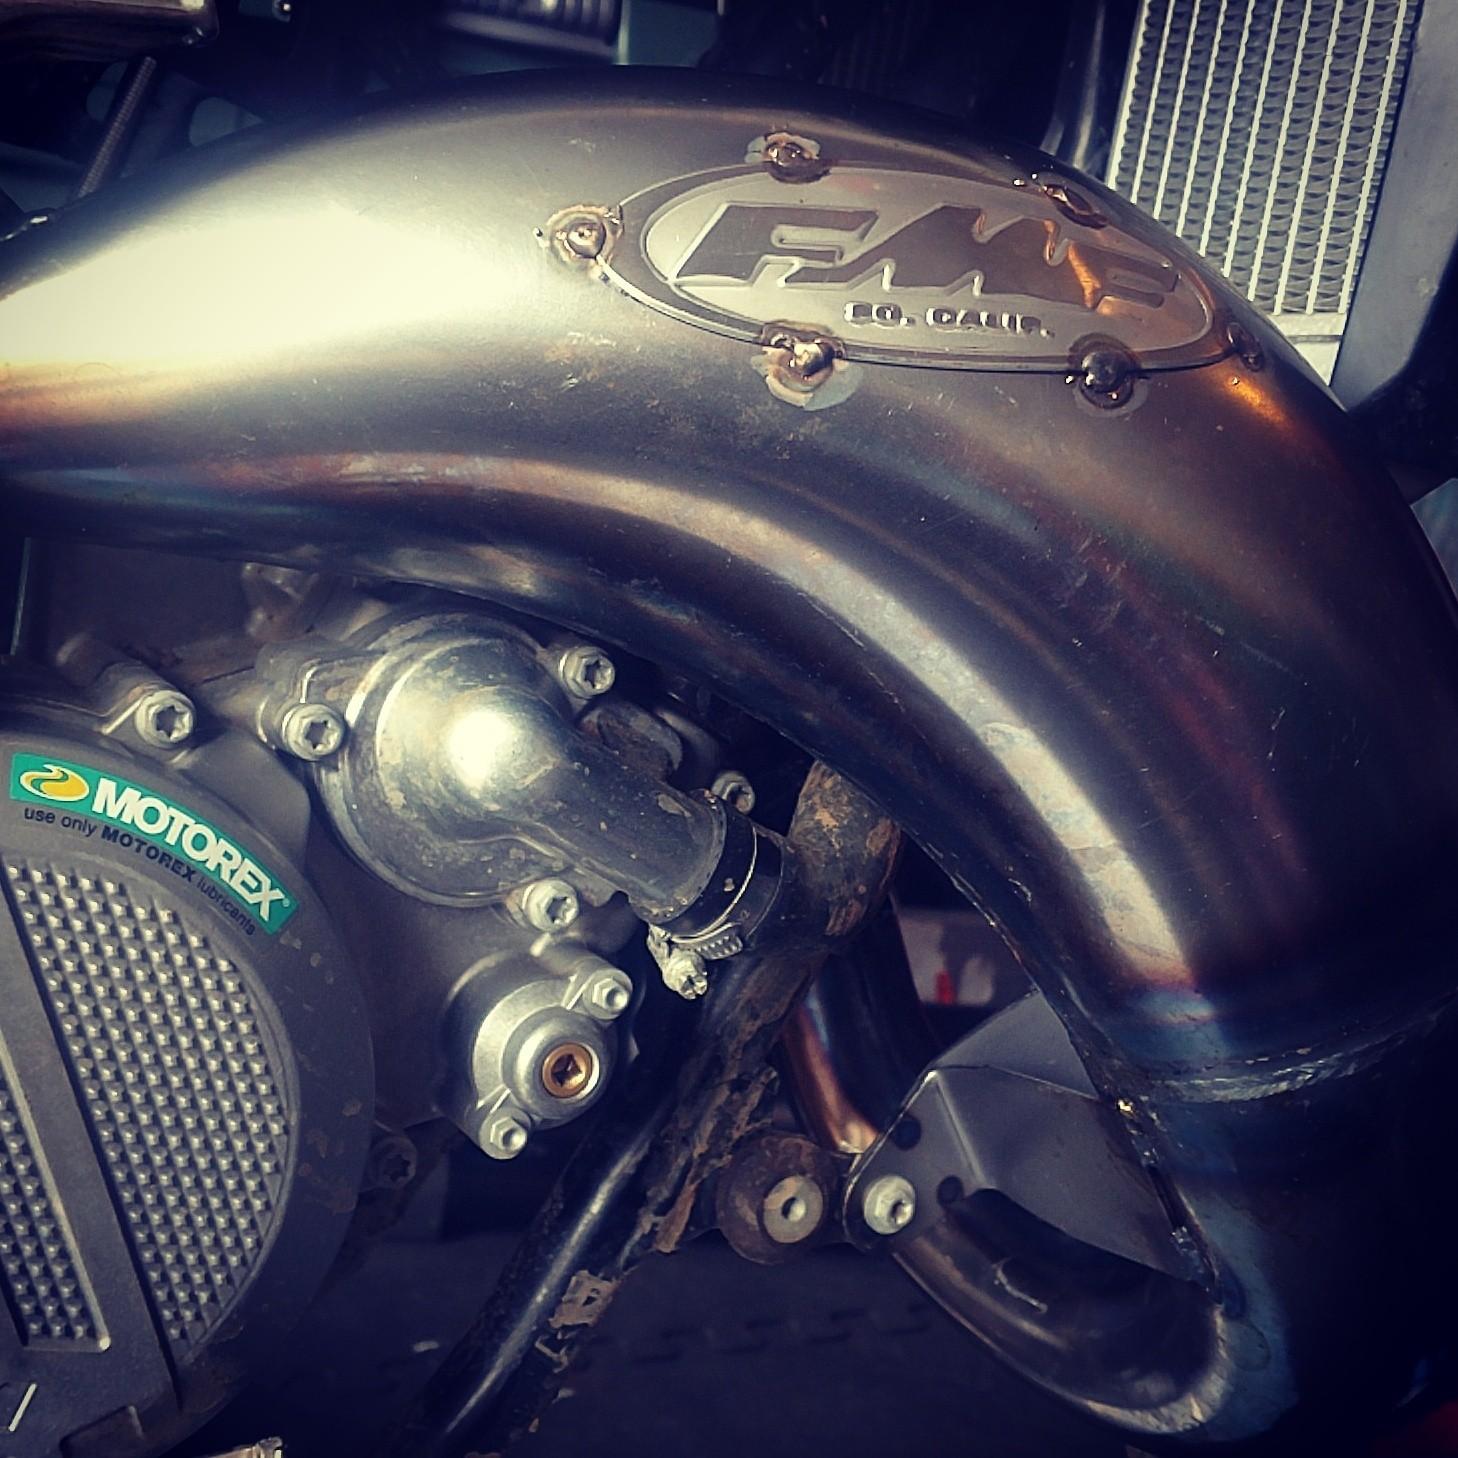 Upgrades - Harbison_916 - Motocross Pictures - Vital MX